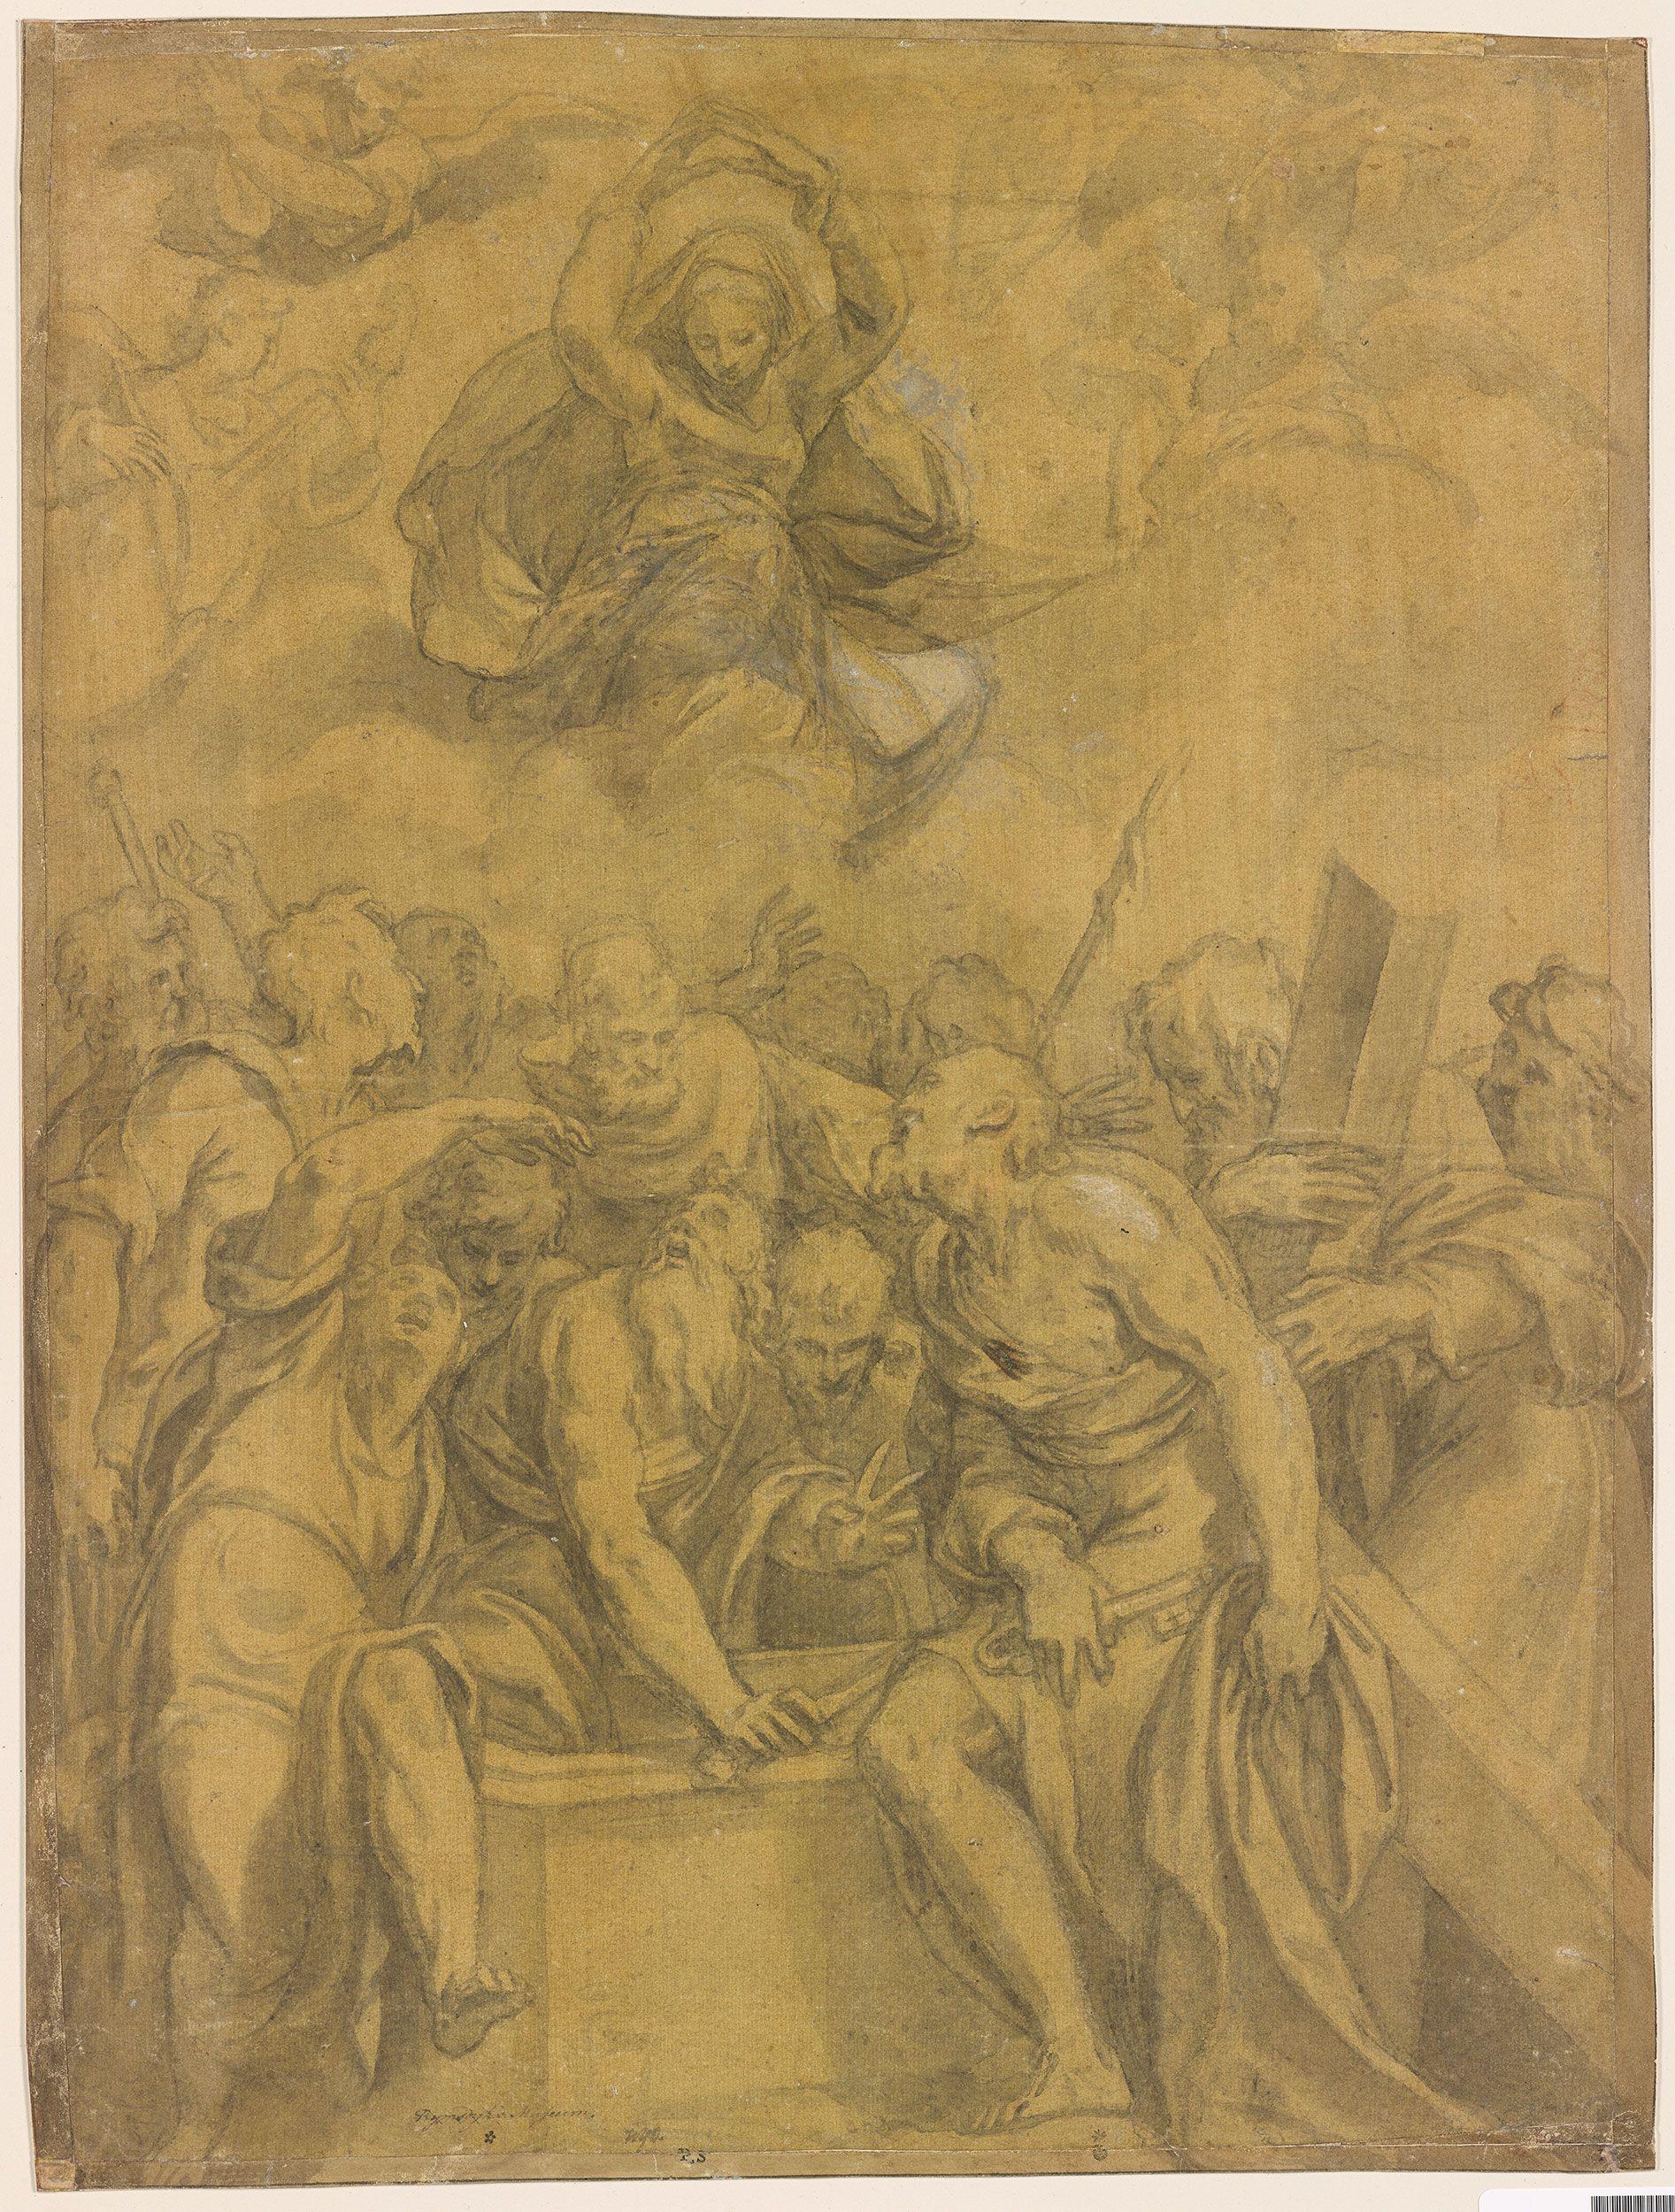 Paolo Farinati | Assumption of the Virgin | ca. 1565 | The Morgan Library & Museum